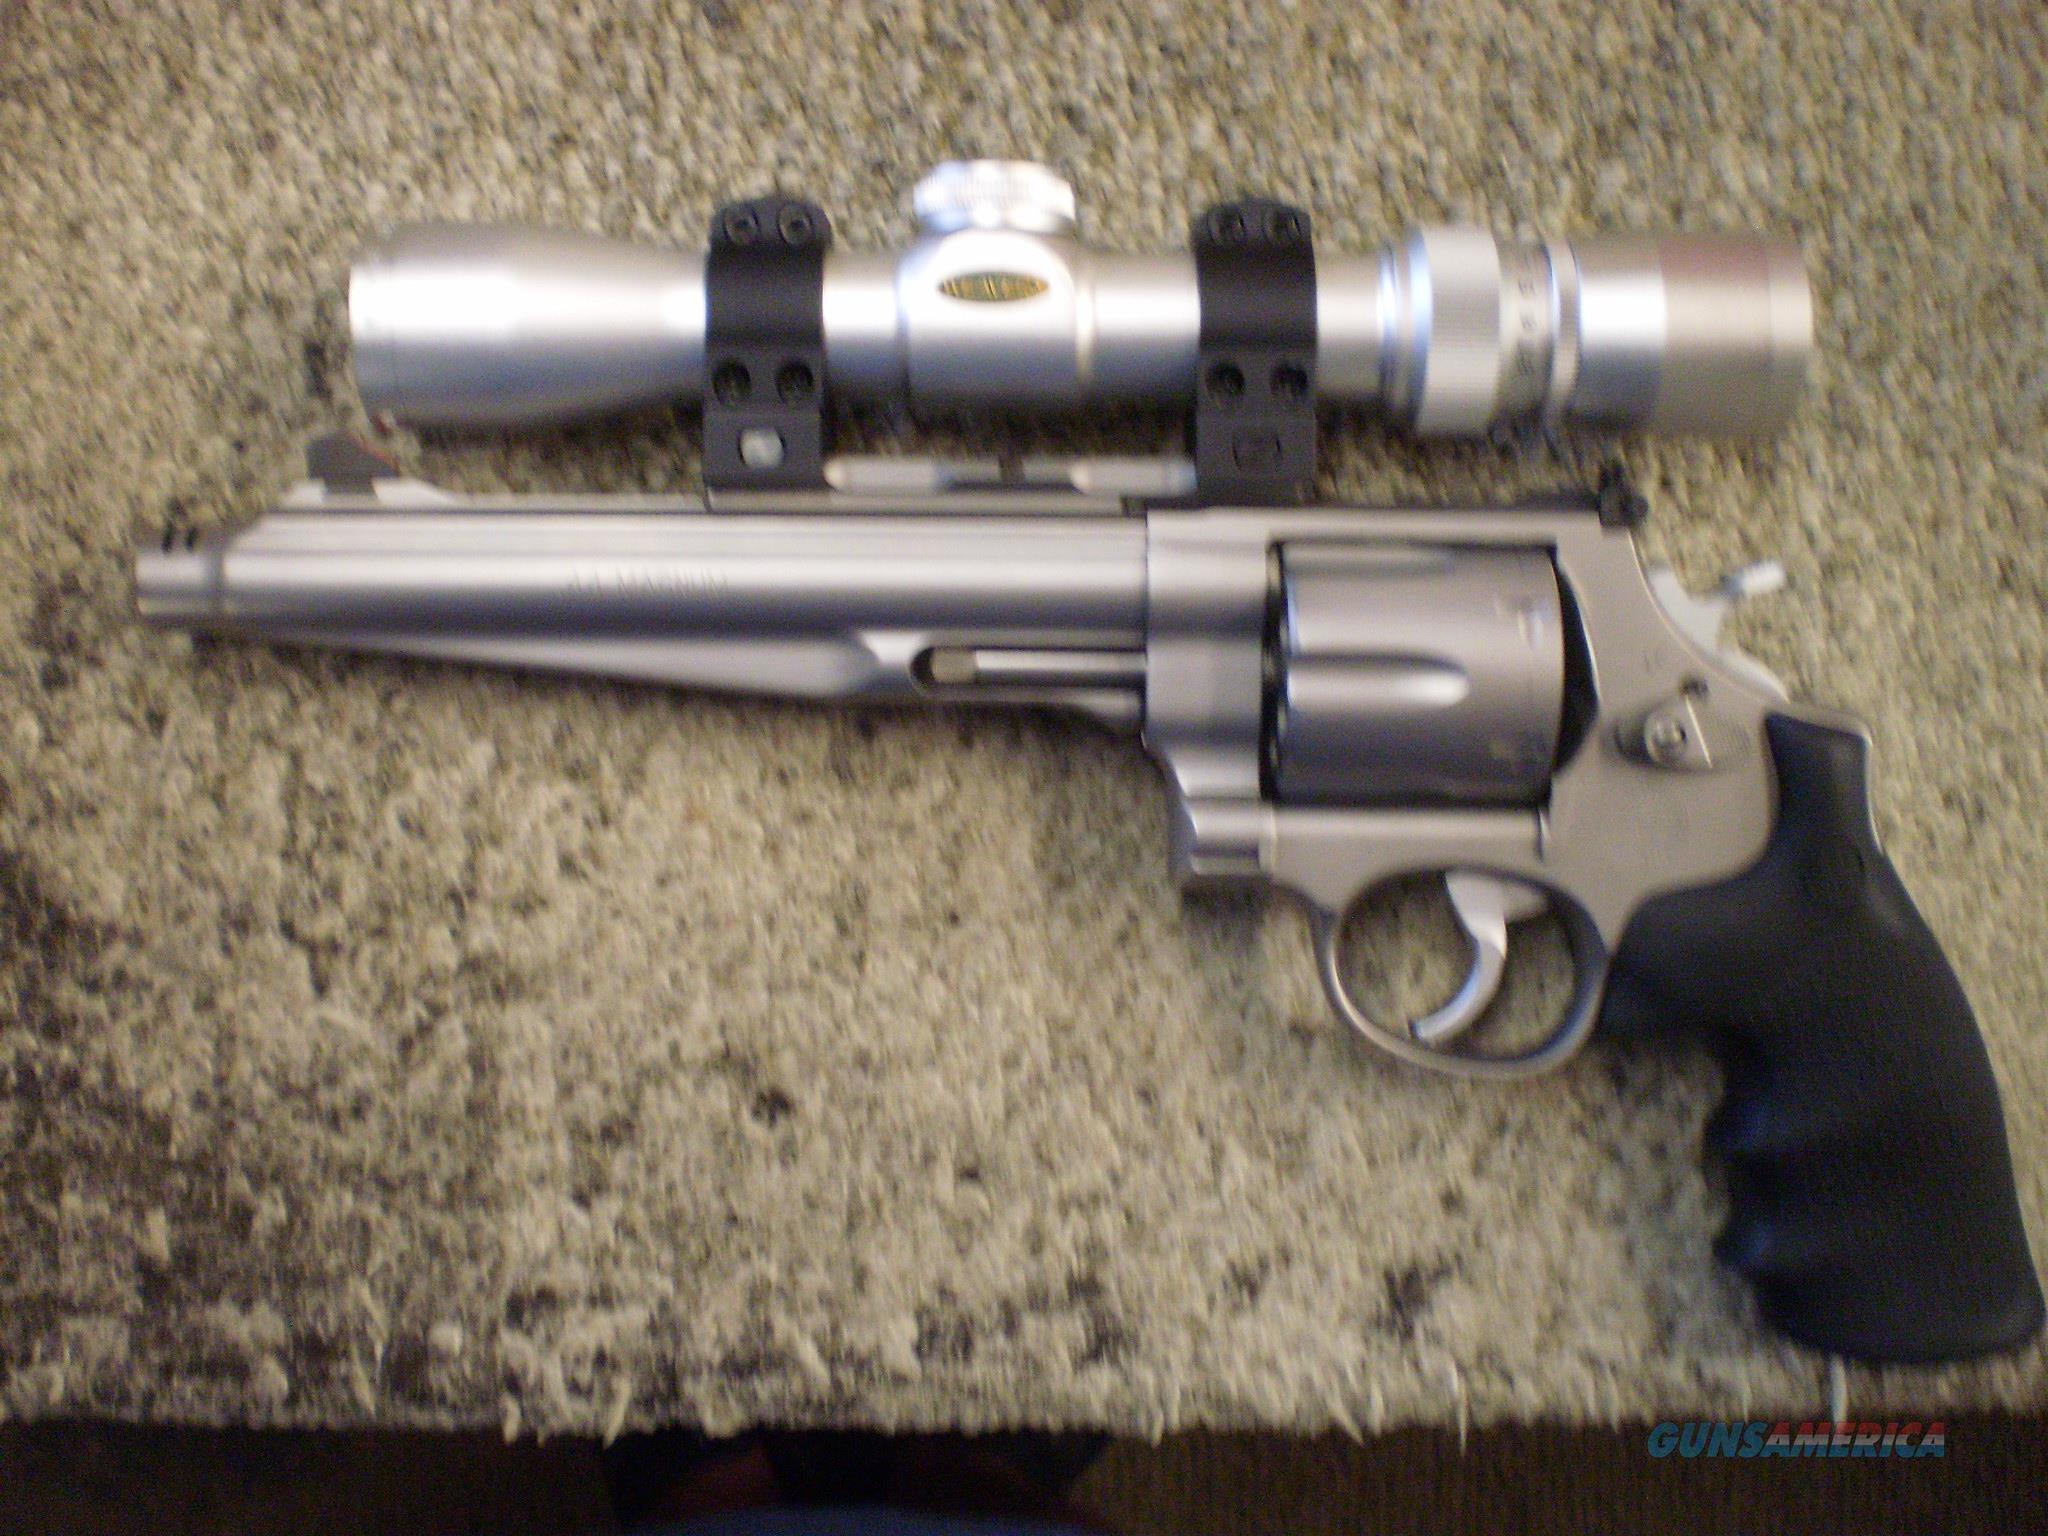 SMITH & WESSON PERFORMANCE CENTER 44 MAGNUM  Guns > Pistols > Smith & Wesson Revolvers > Performance Center